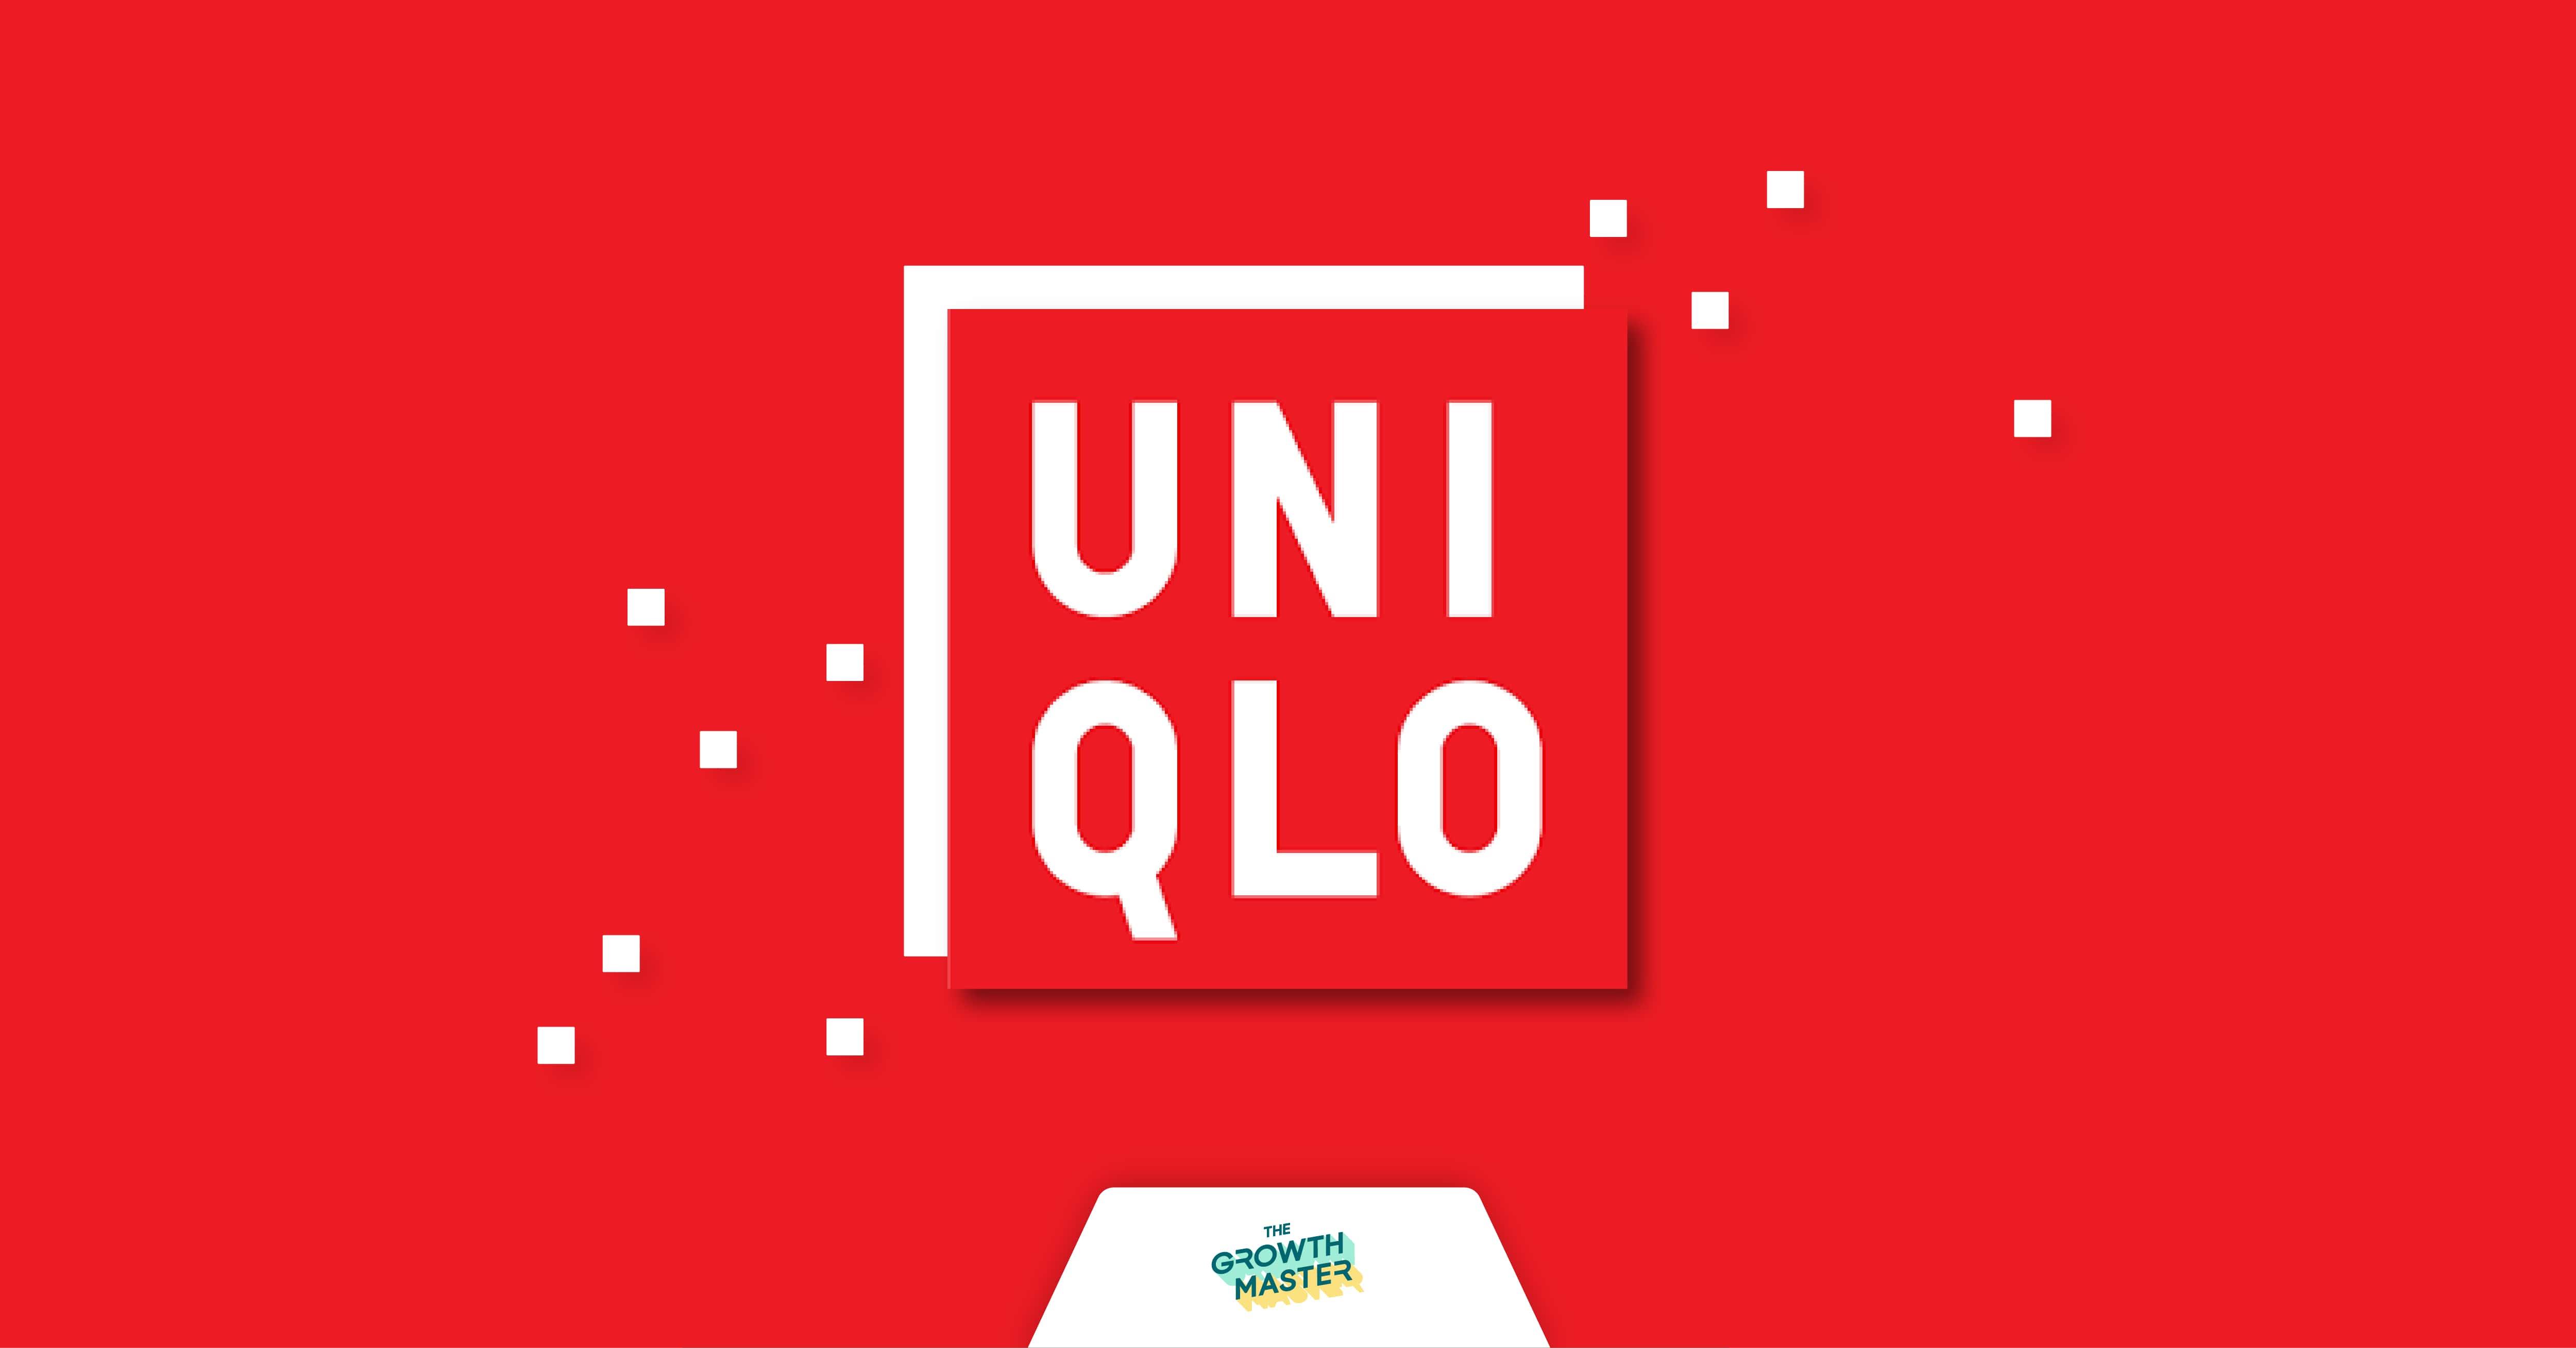 CASE STUDY : Uniqlo แบรนด์เสื้อผ้าชื่อดังสัญชาติญี่ปุ่น กวาดรายได้ 2.33 ล้านล้านเยนในปีล่าสุด